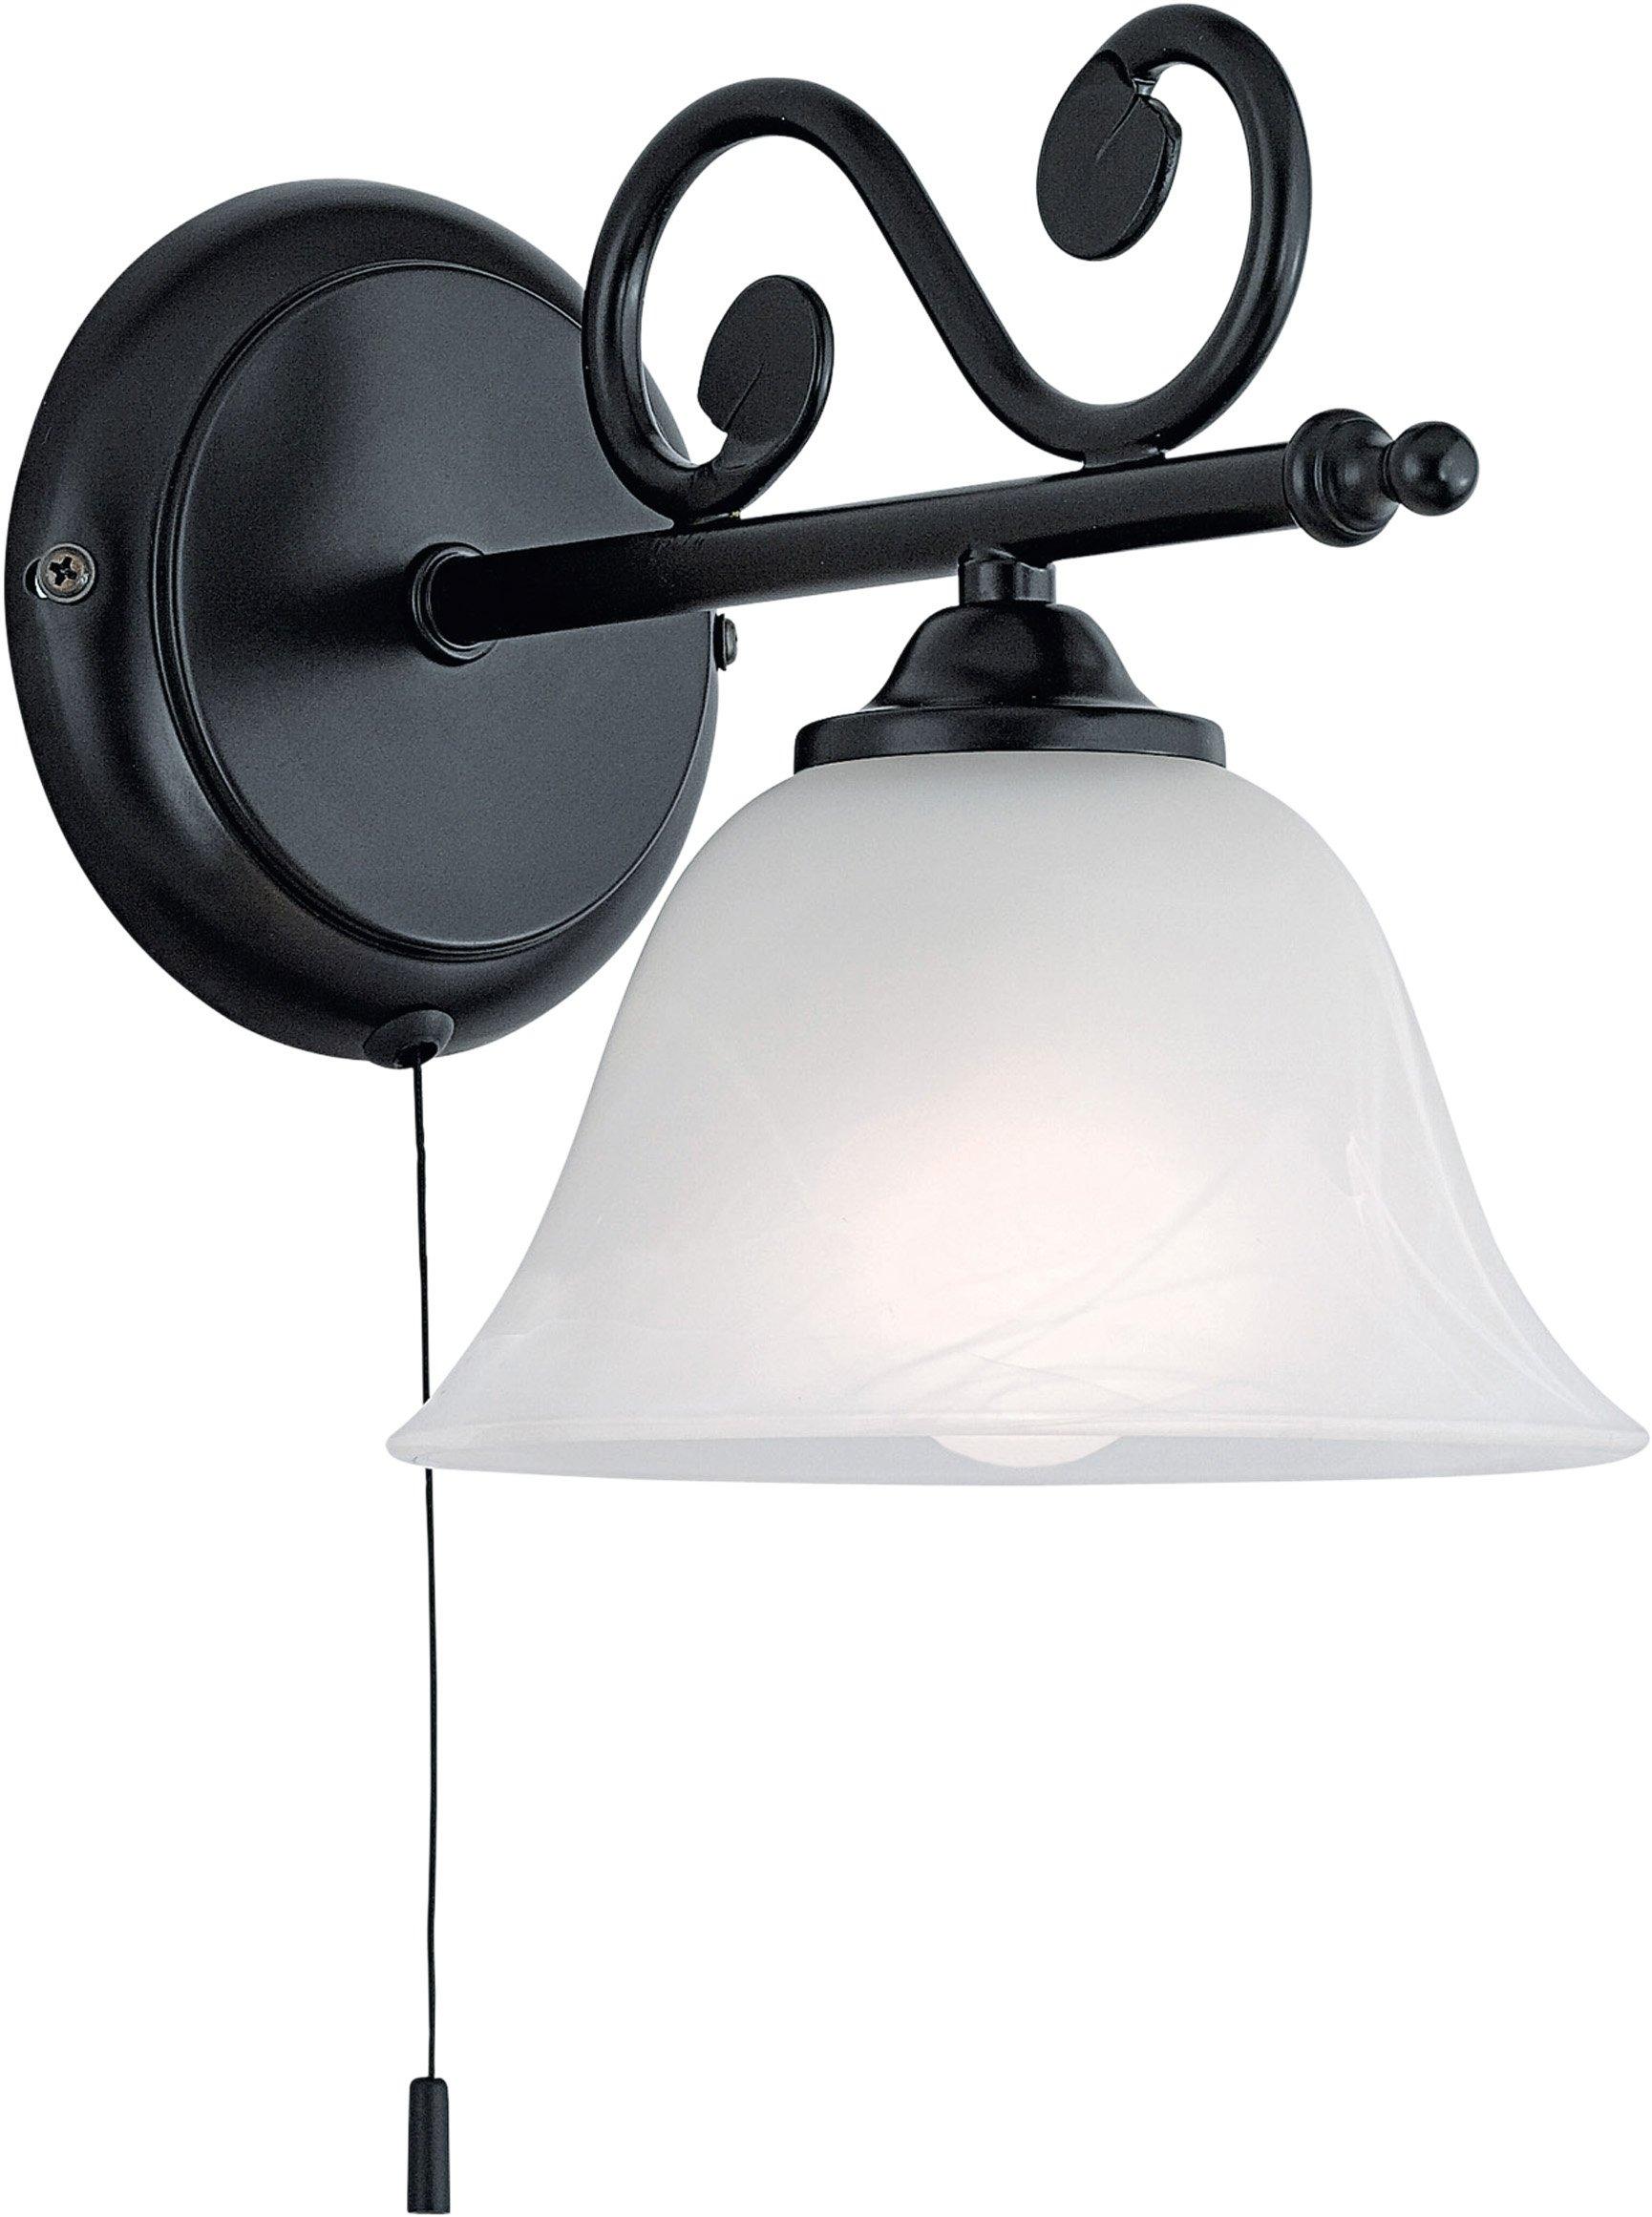 EGLO wandlamp MURCIA online kopen op otto.nl